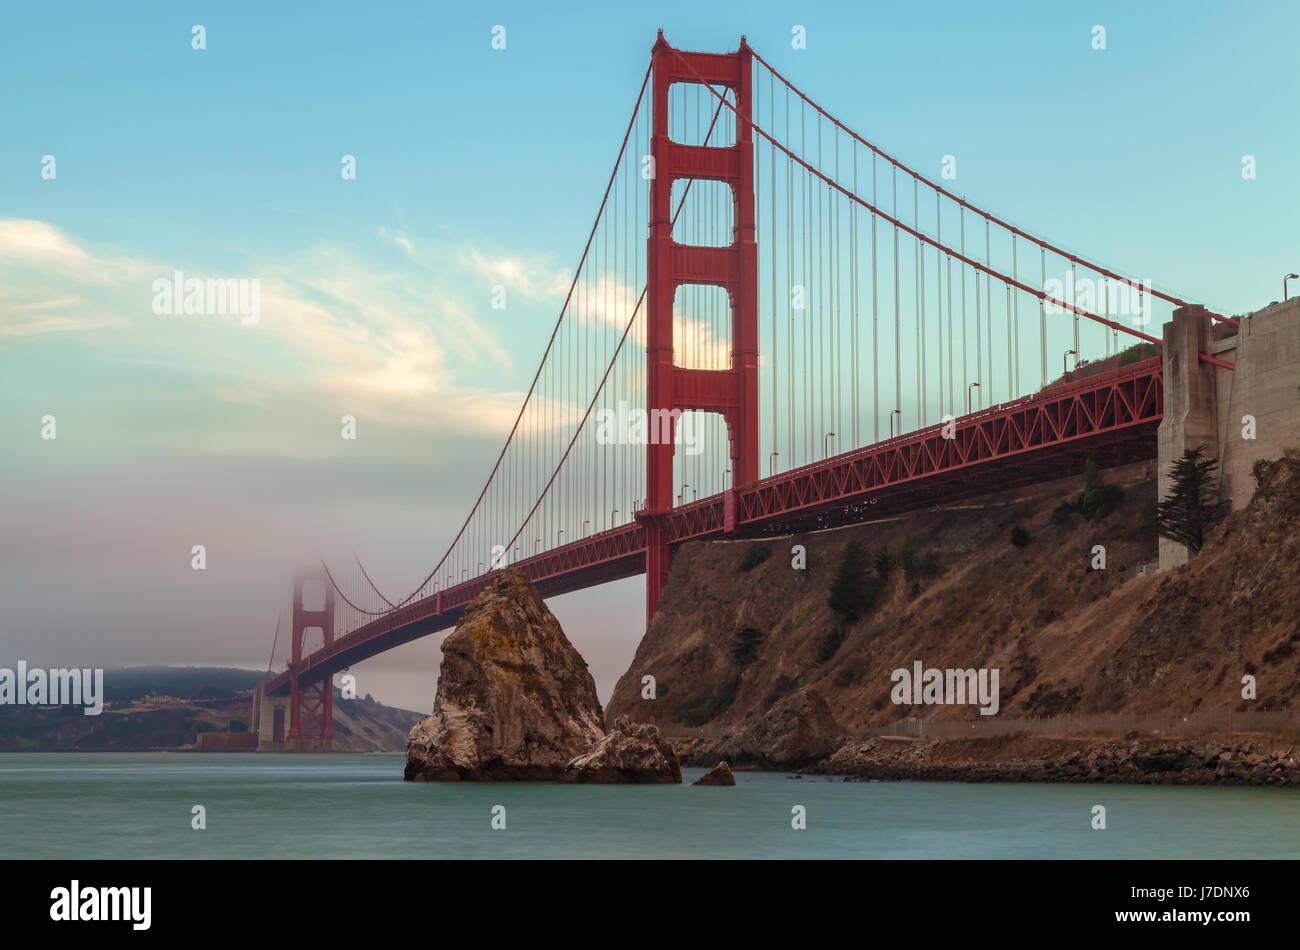 Die Golden Gate Bridge in San Francisco, Kalifornien Stockbild